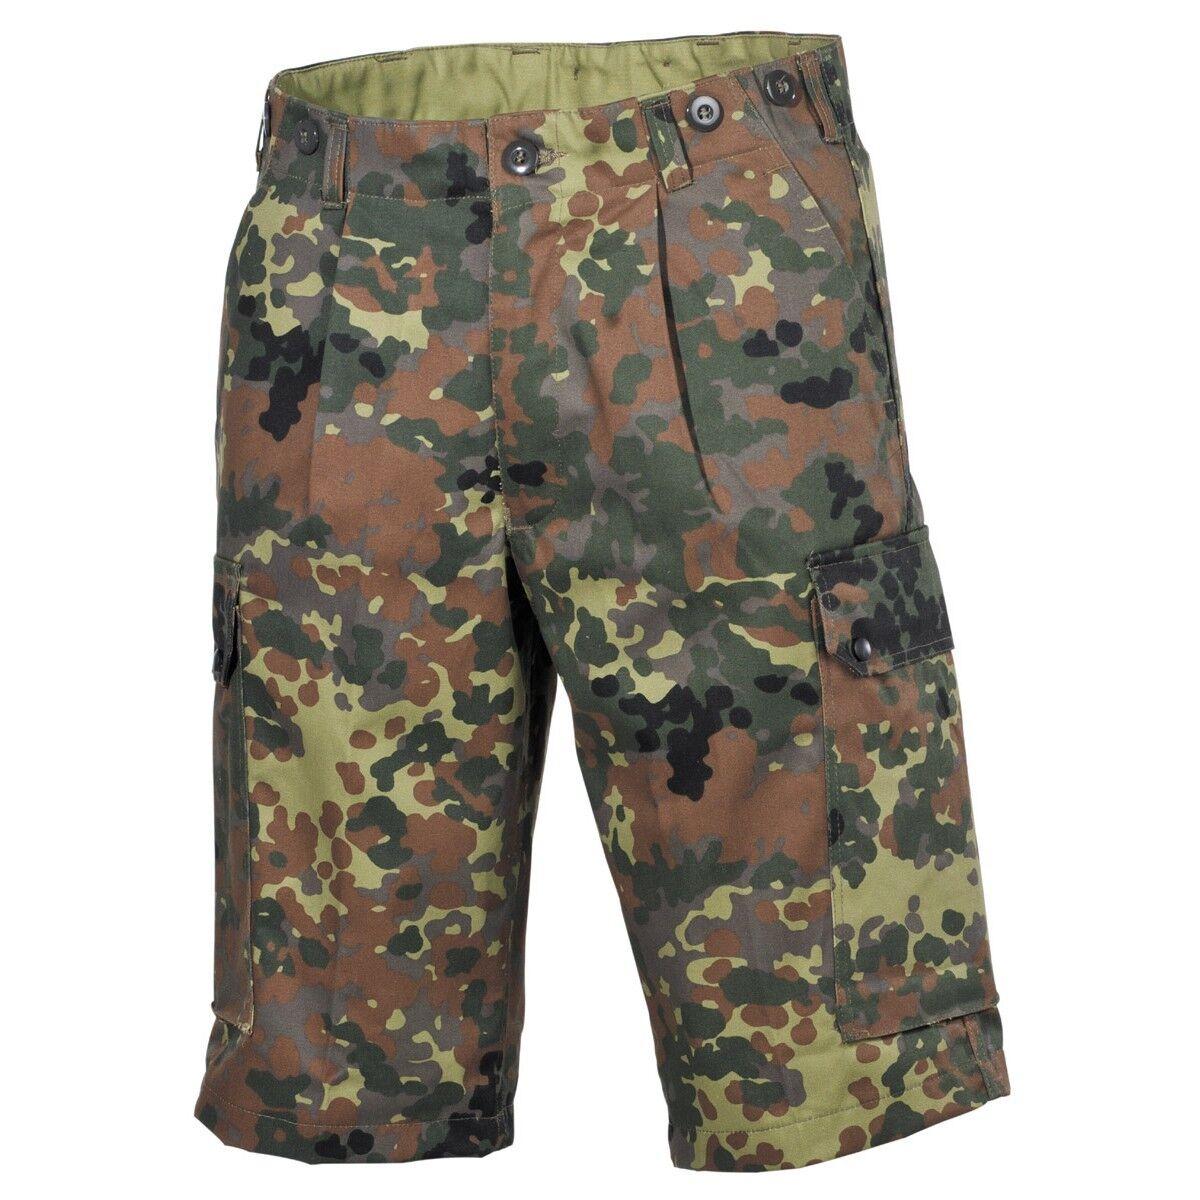 MFH Pantalones cortos Bermudas hombre militar campamento caza pesca BW Camo